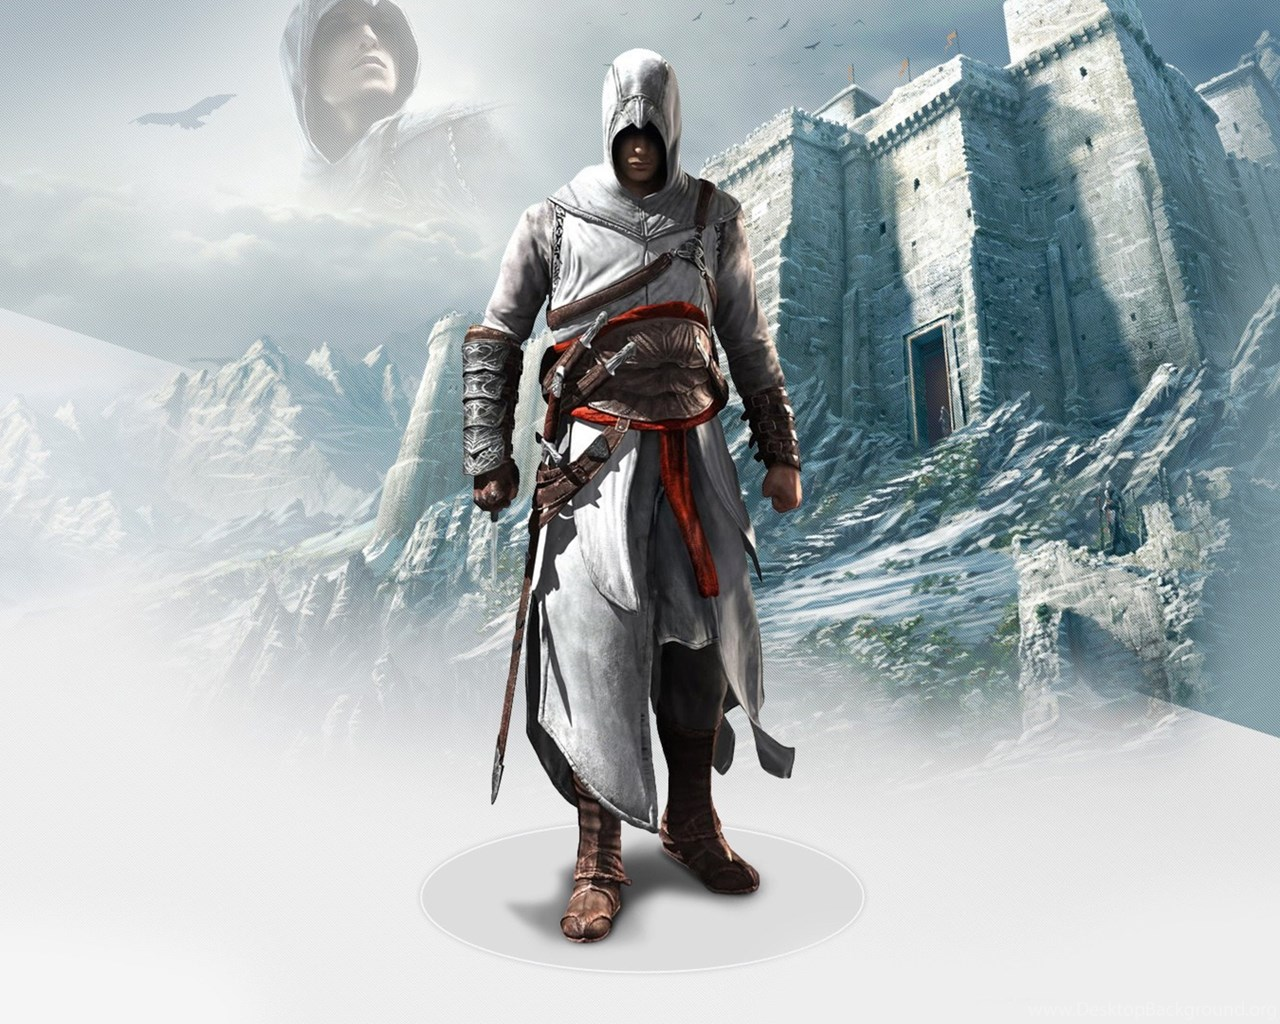 assassins creed 5 wallpaper - photo #16